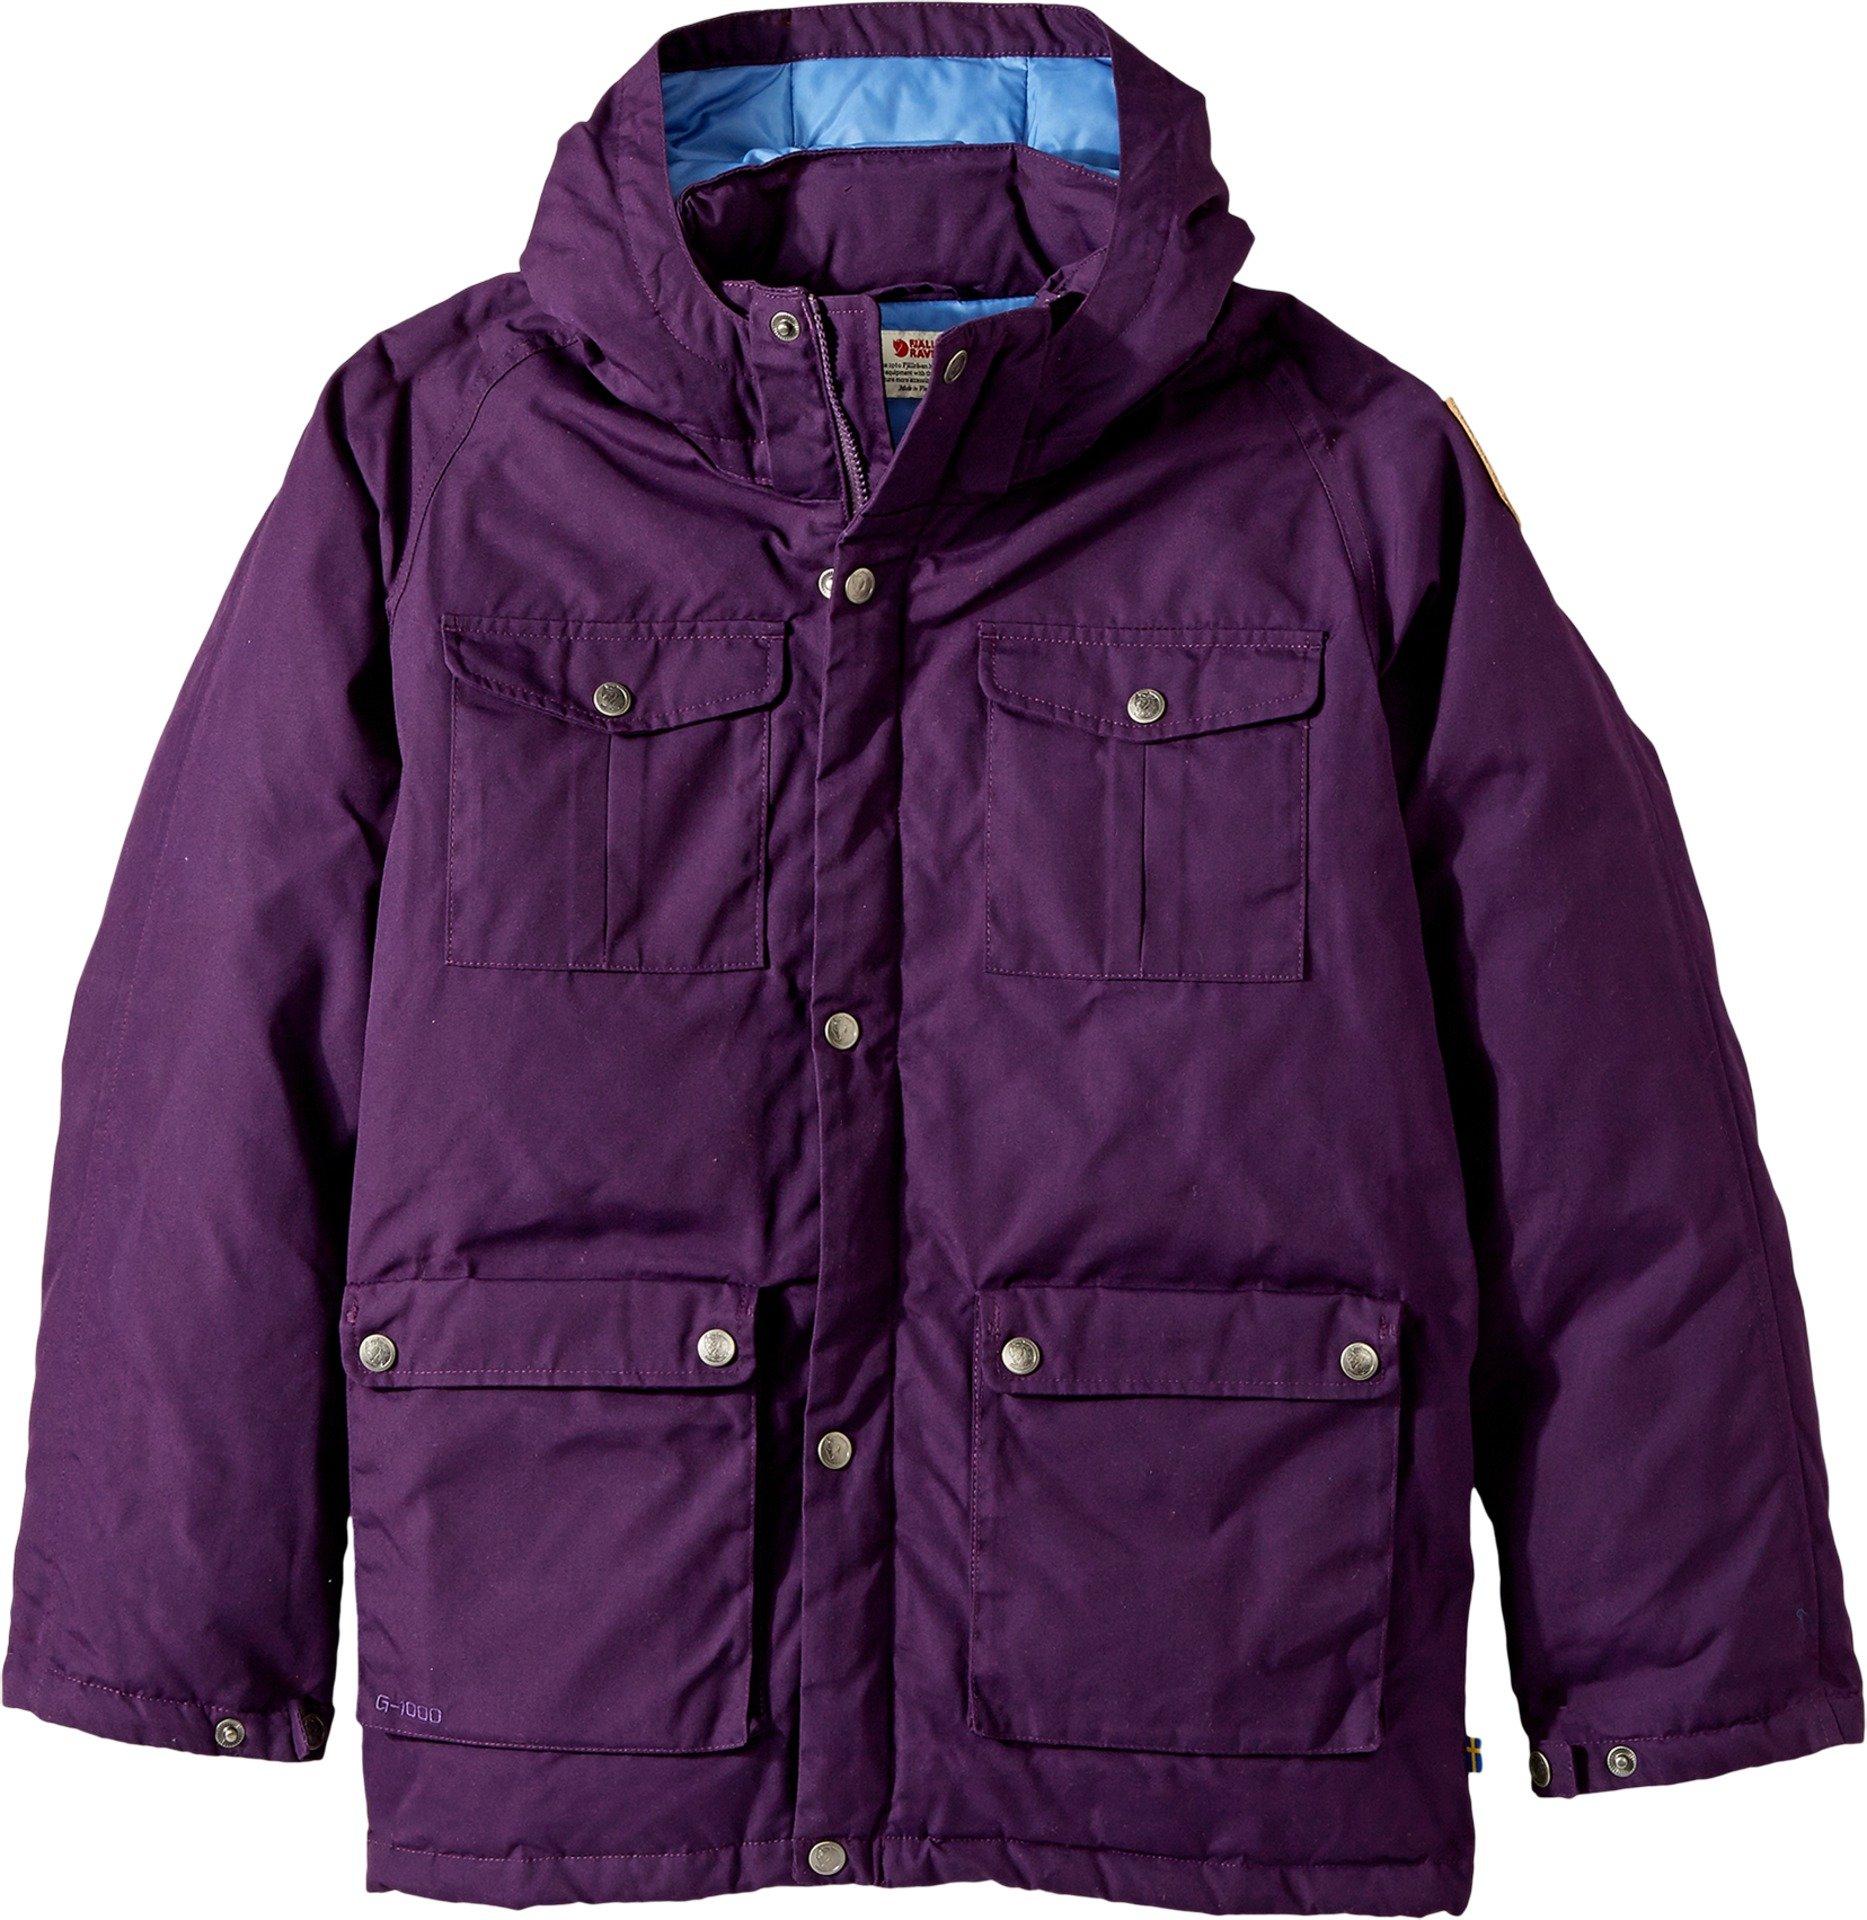 Fjällräven Kids Unisex Greenland Down Parka (Big Kids) Apine Purple 11-12 Years